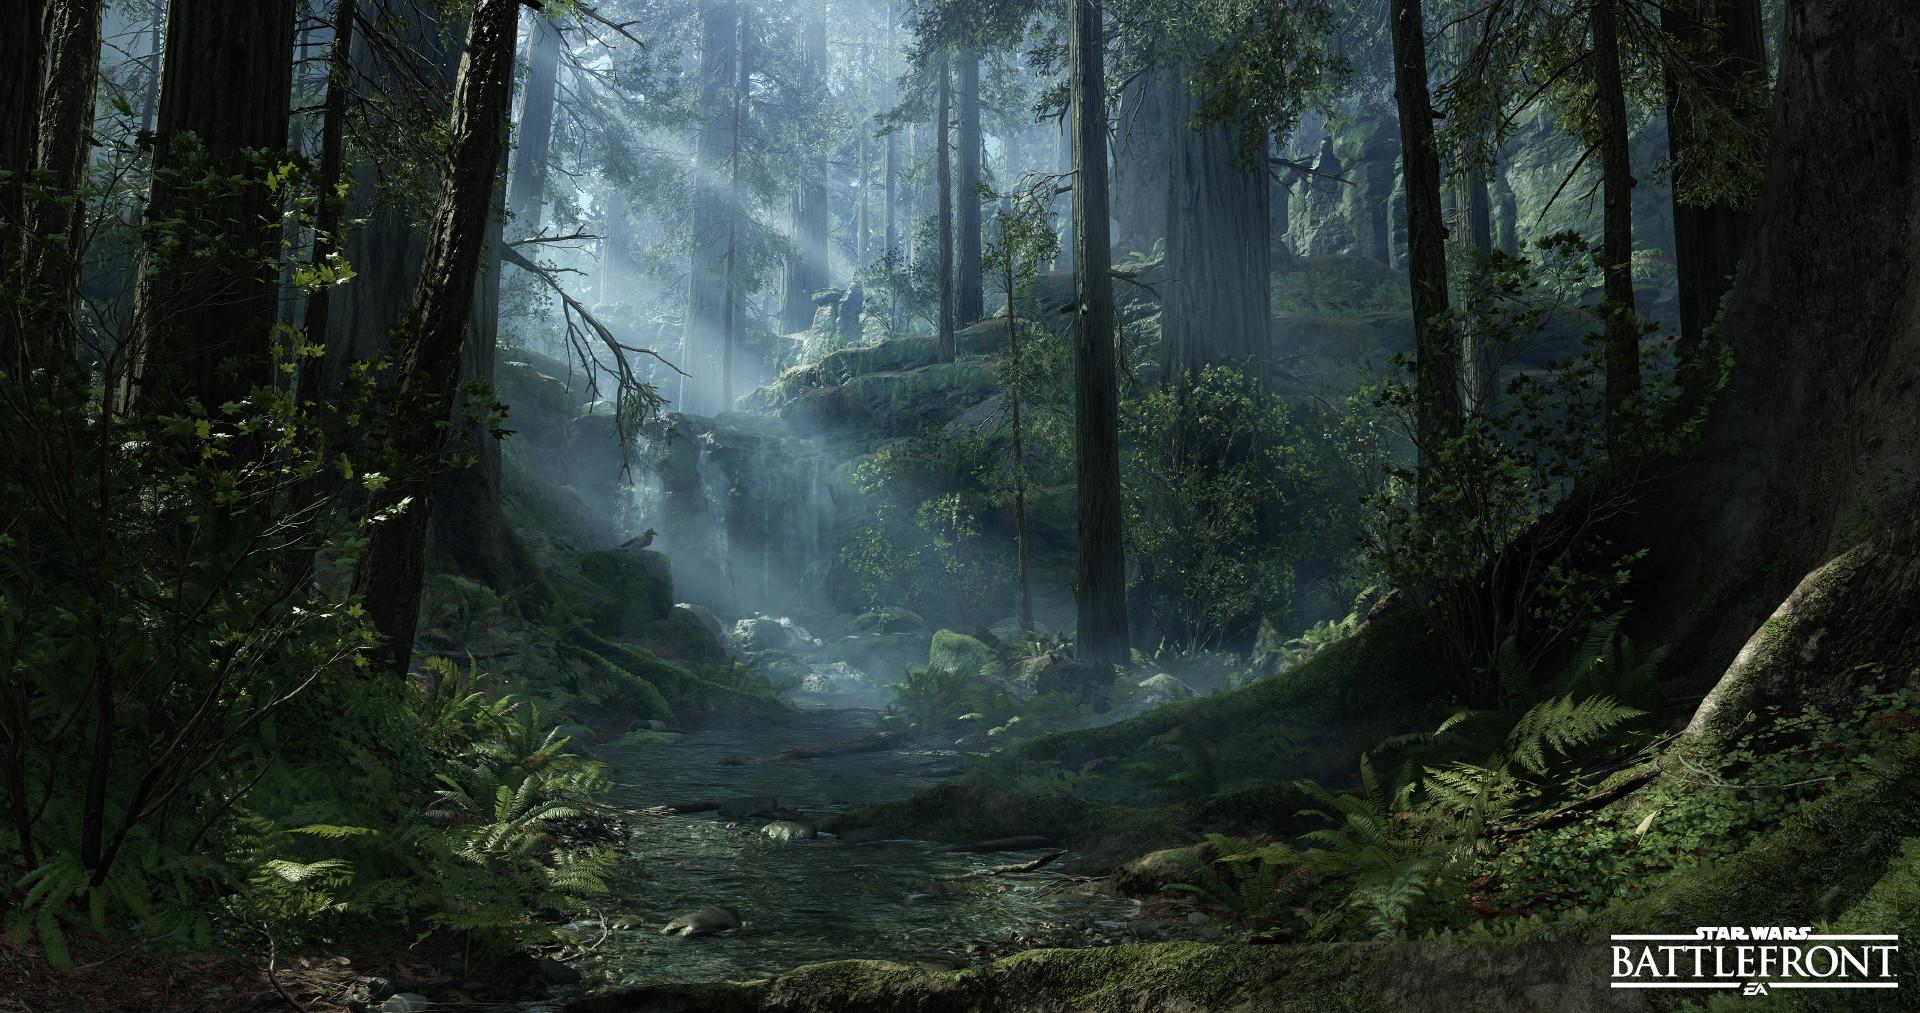 Endor: Swamp Crash Site